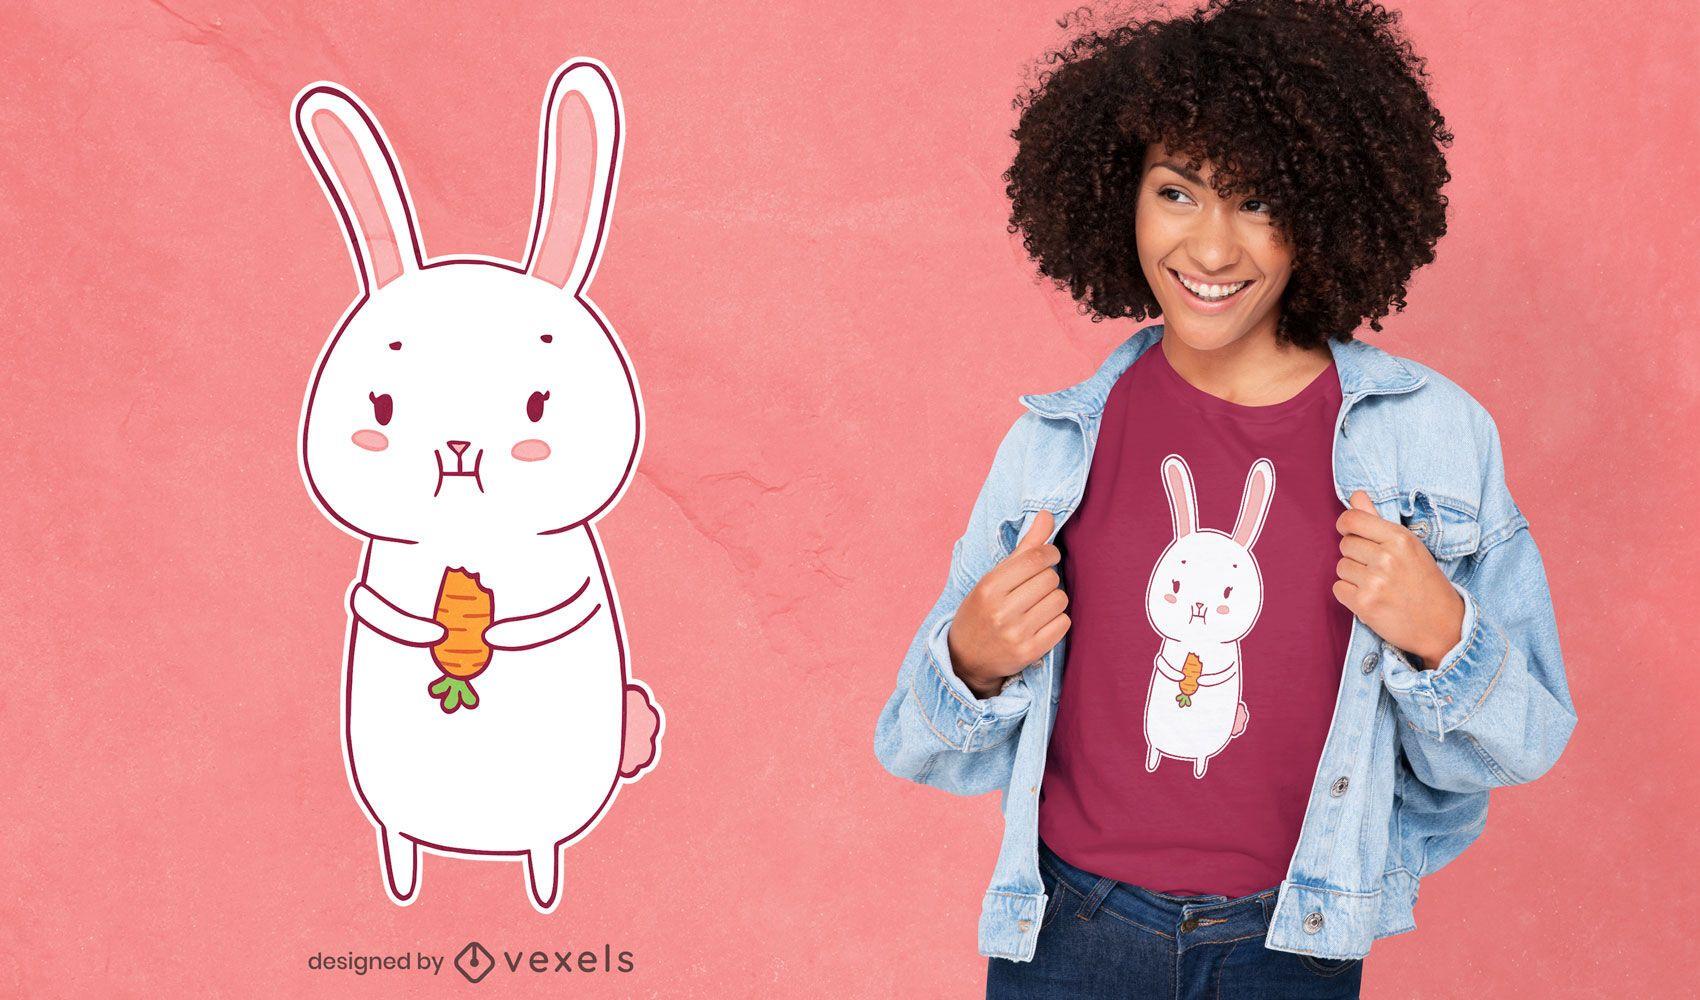 Diseño de camiseta lindo conejito comiendo zanahoria